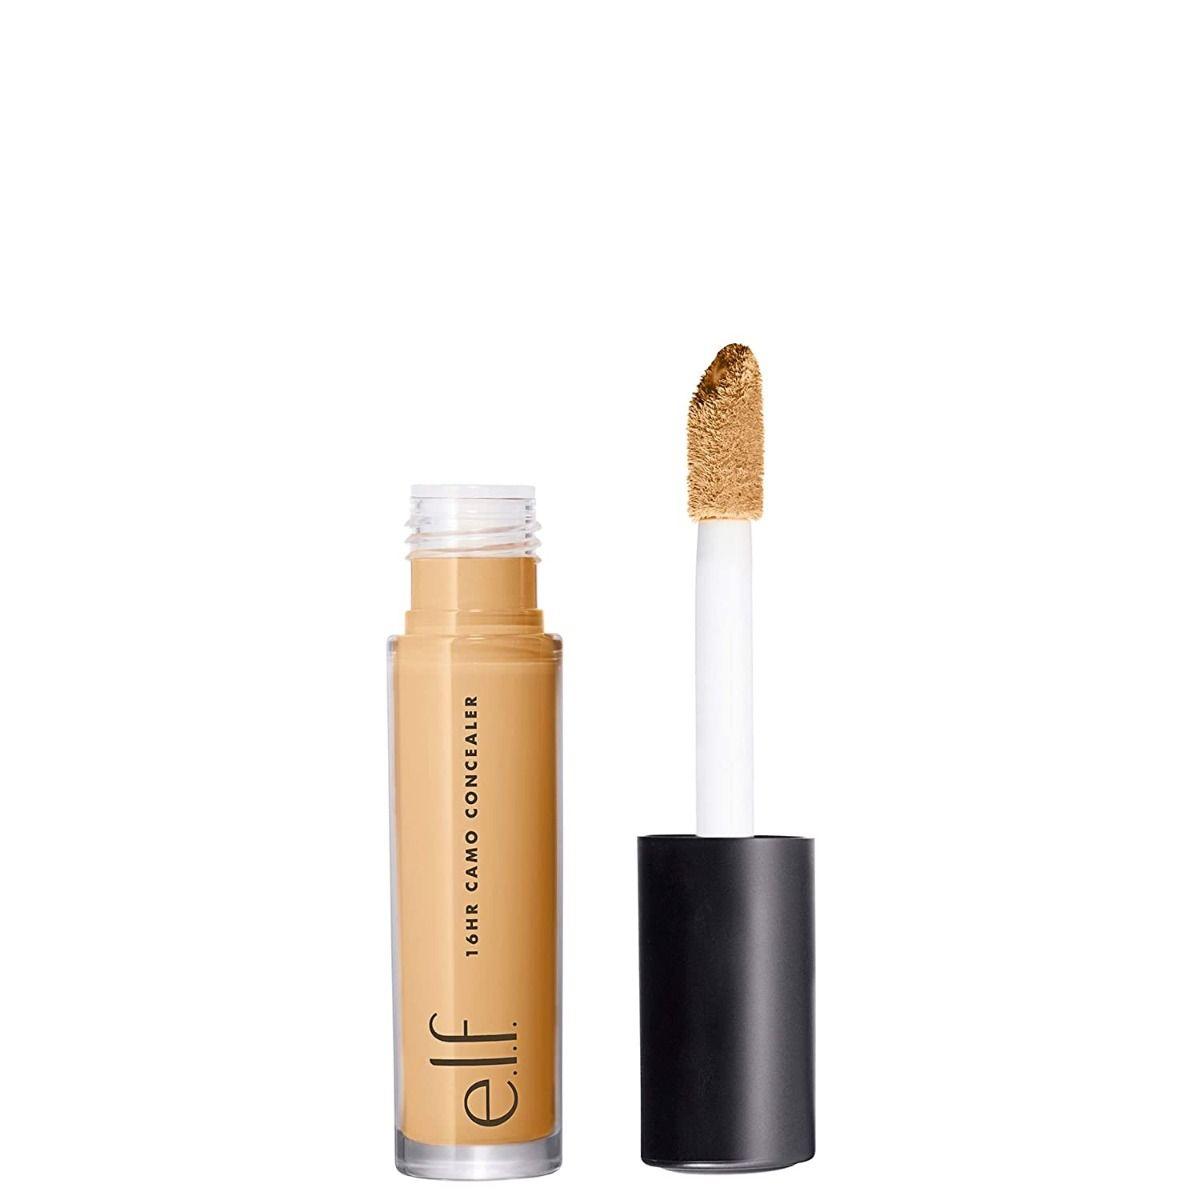 e.l.f. Cosmetics 16HR Camo Concealer Medium Peach 6ml